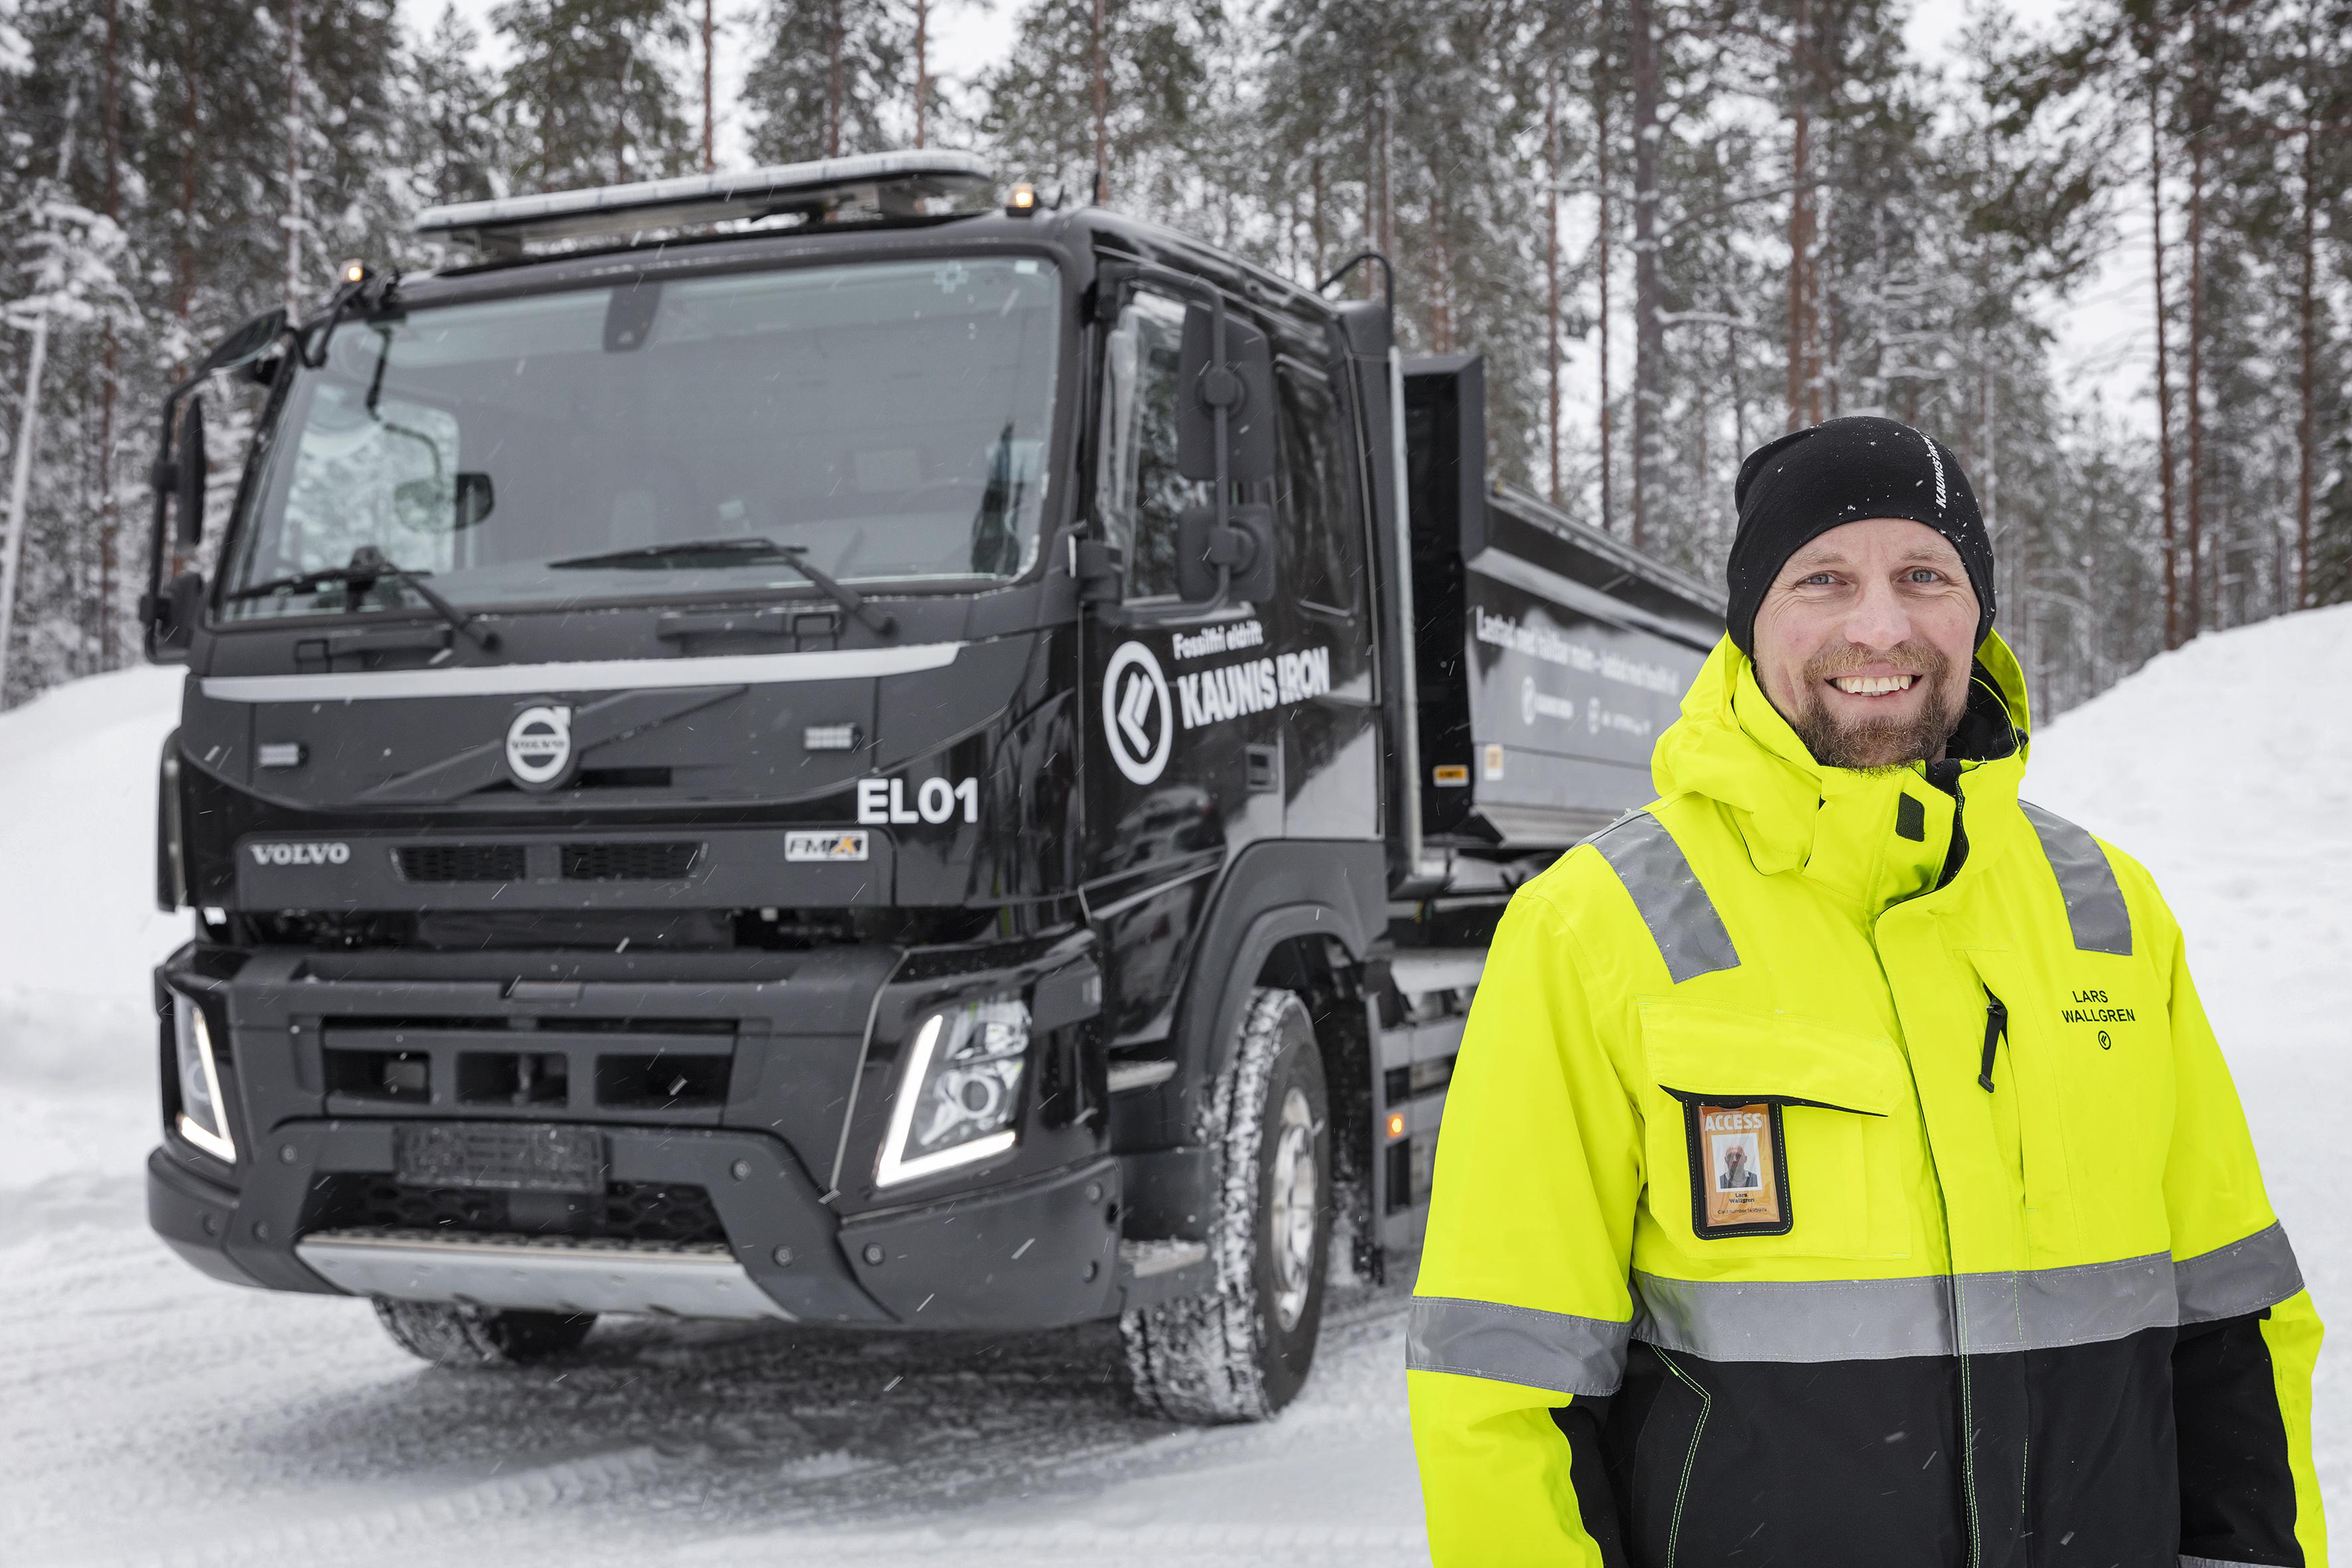 EllastbilTestKaunis-5 Lars Wallgren